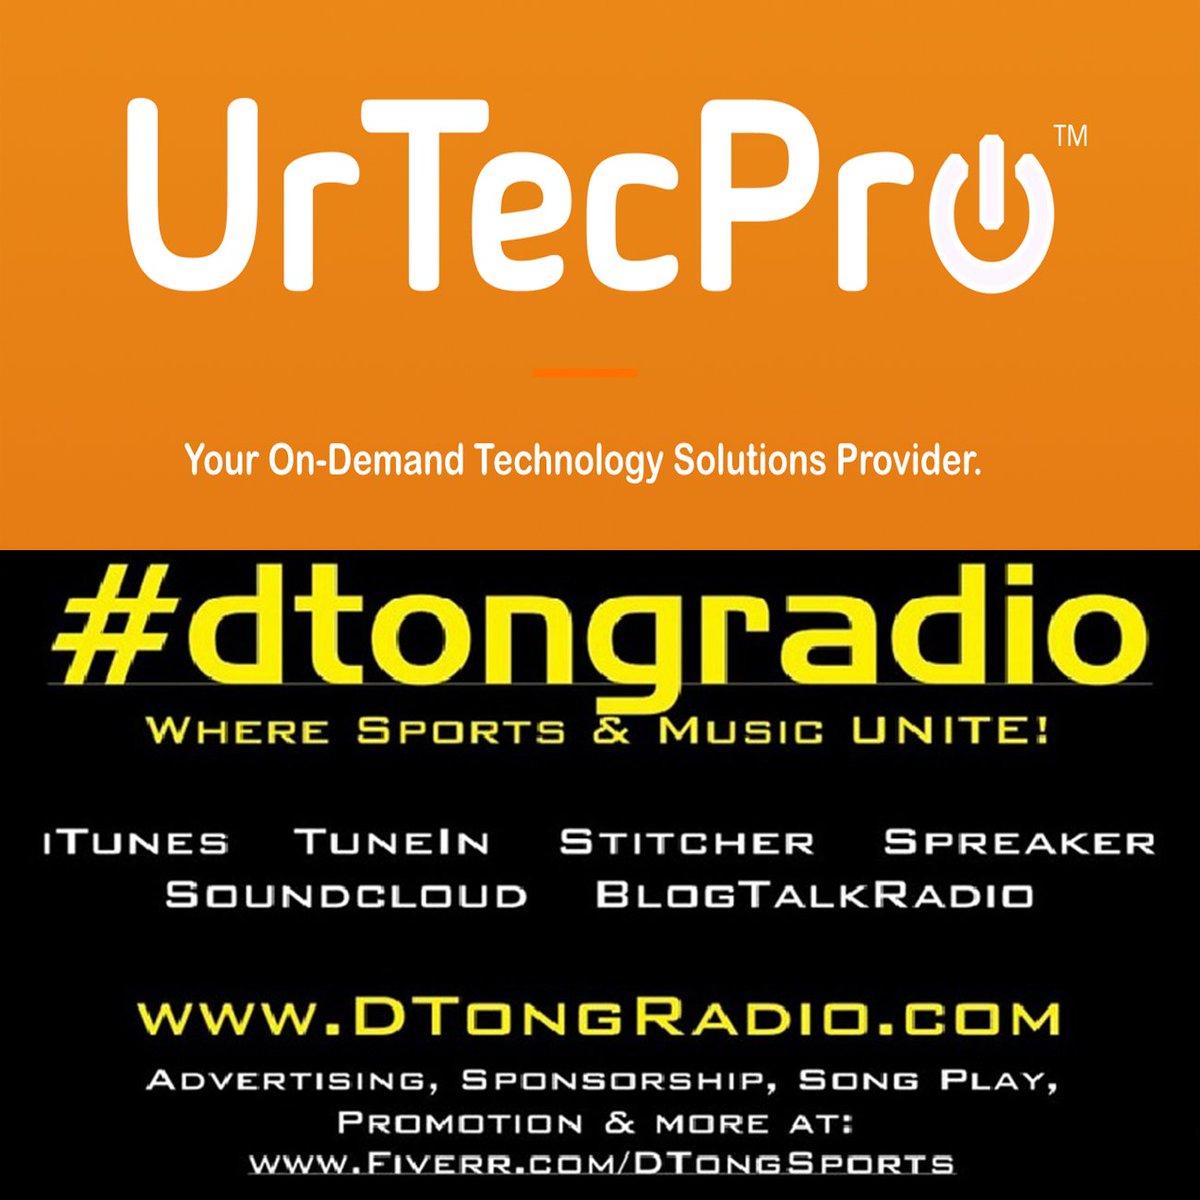 #NowPlaying LIVE on #dtongradio  All Independent Music Weekend Showcase   http://www. DTongRadio.com  &nbsp;    &amp; #spreaker:  https://www. spreaker.com/user/dtongspor ts/all-independent-music-weekend-showcase-p_45?autoplay=1 &nbsp; …   &amp; #periscope :  https://www. pscp.tv/w/1kvKpkZMpqkxE  &nbsp;    #edm #hiphop #rap #popmusic #rockmusic #newmusic #indiemusic #radio #podcast #liveradio #sundayfunday #np<br>http://pic.twitter.com/V8P0VoO78T